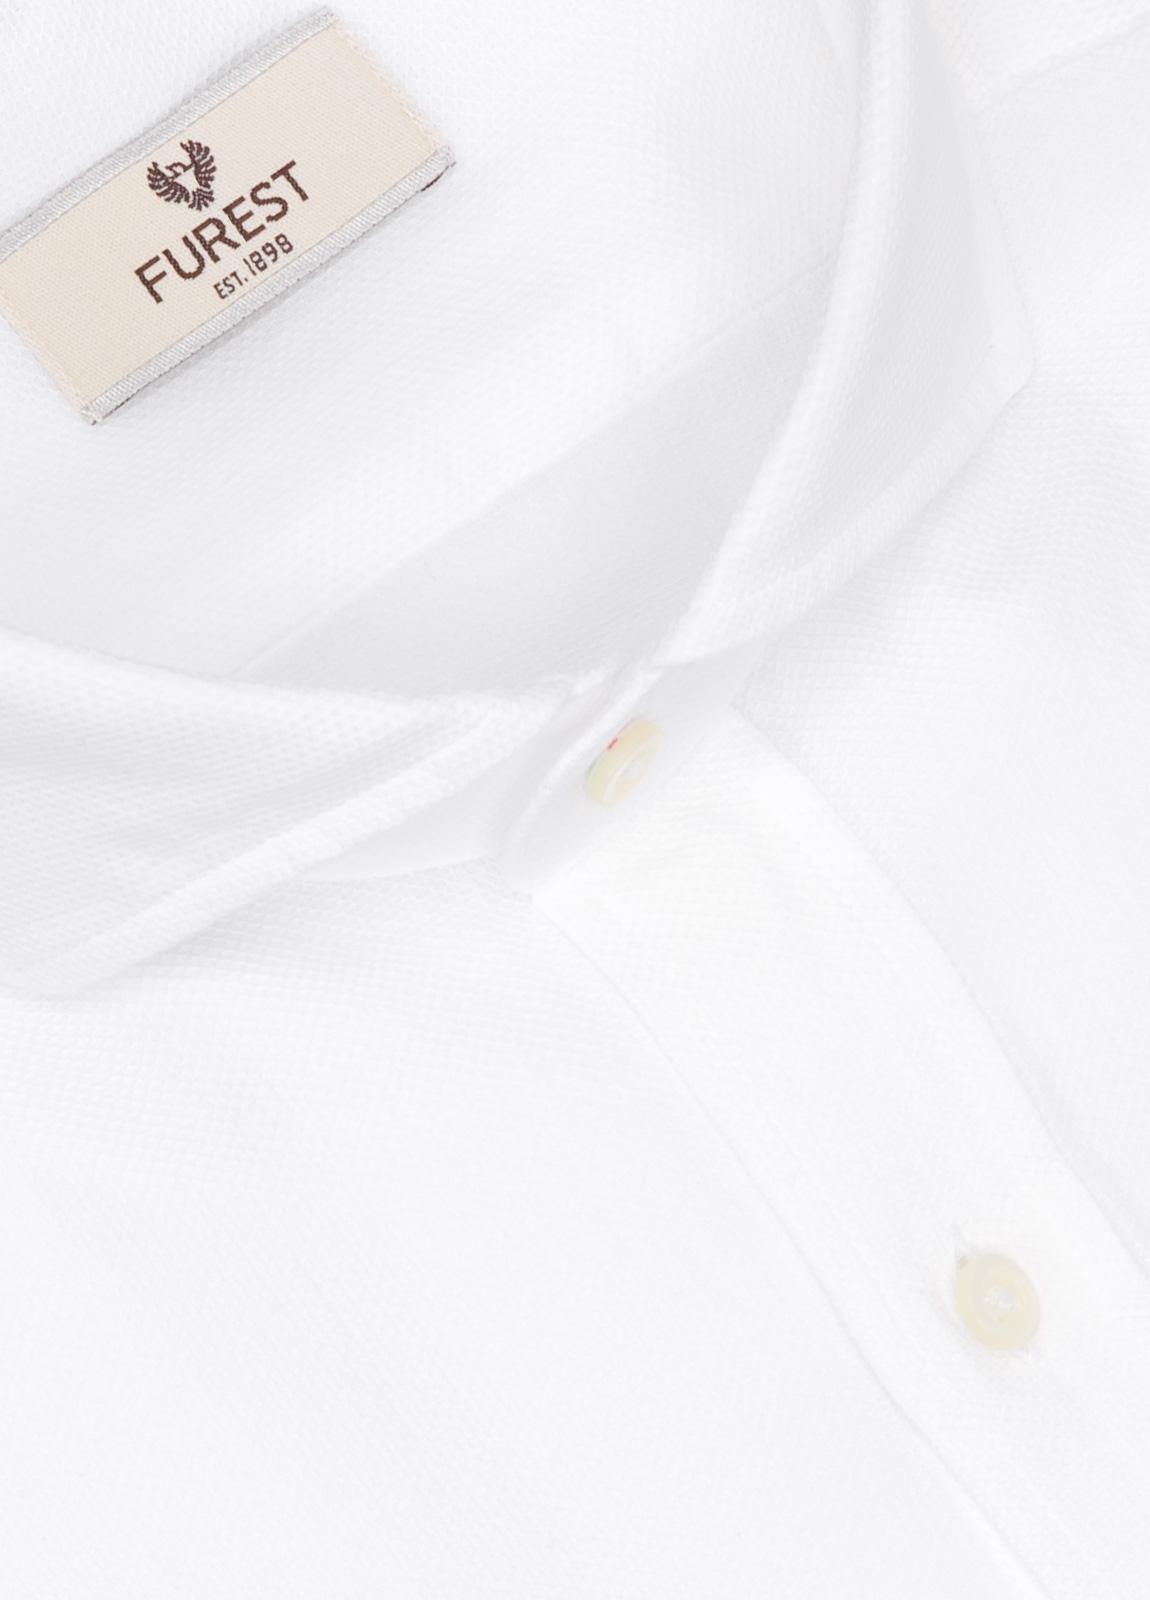 Camisa Leisure Wear SLIM FIT Modelo CAPRI micro textura color blanco. 100% Algodón. - Ítem1